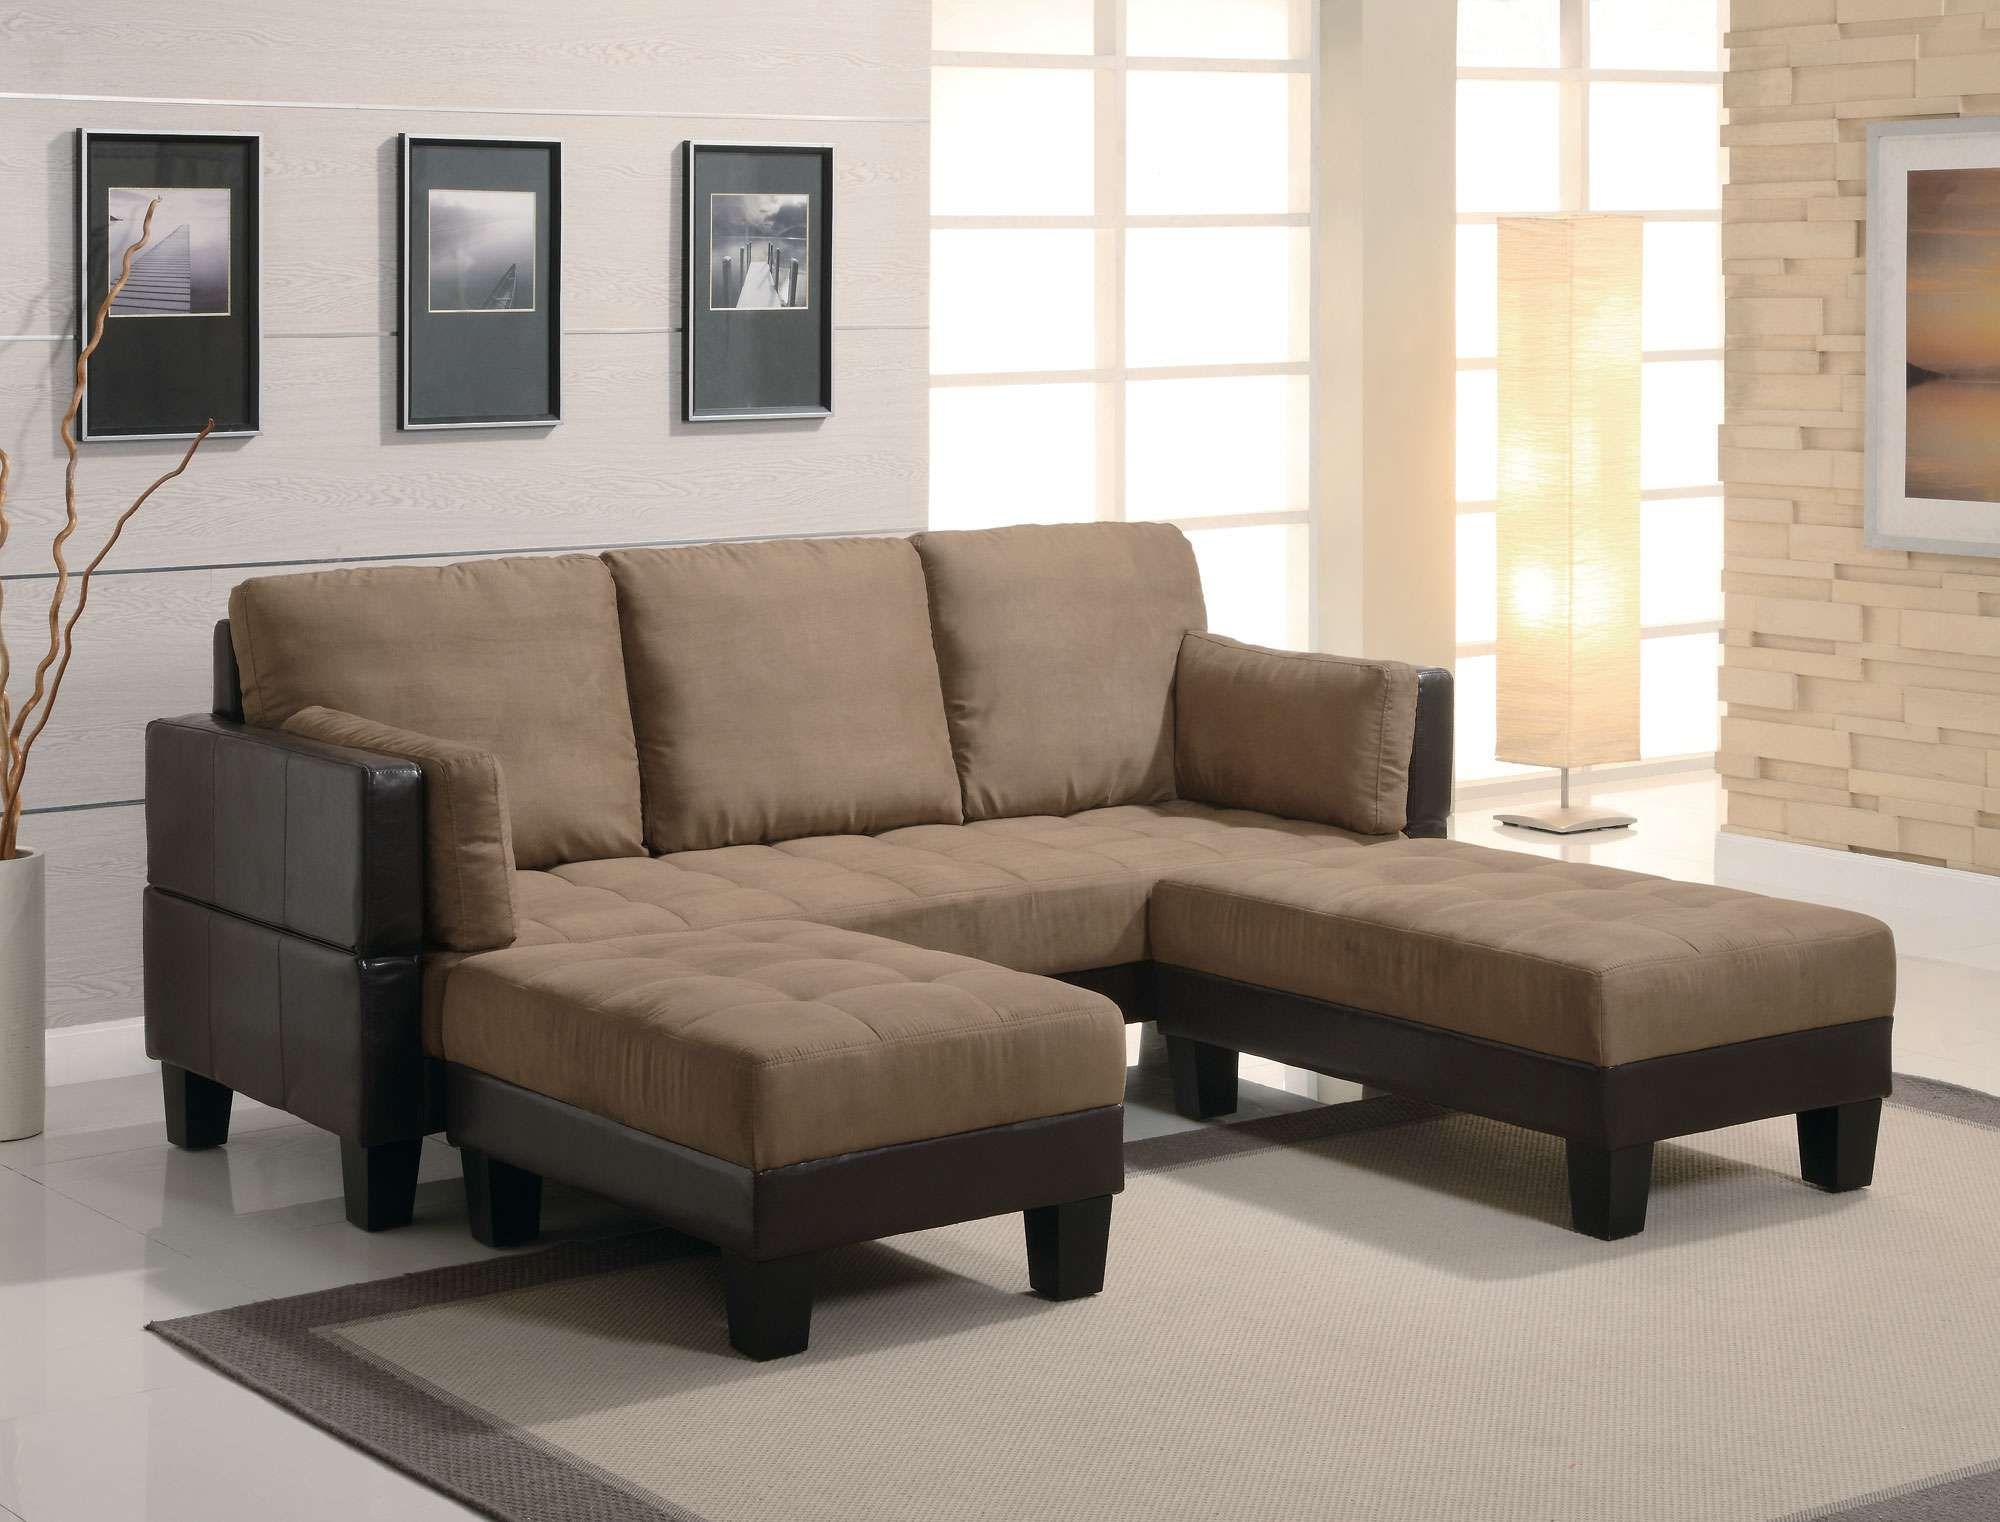 Coaster 300160 Hot Ers Sofa Bed Set Microfiber